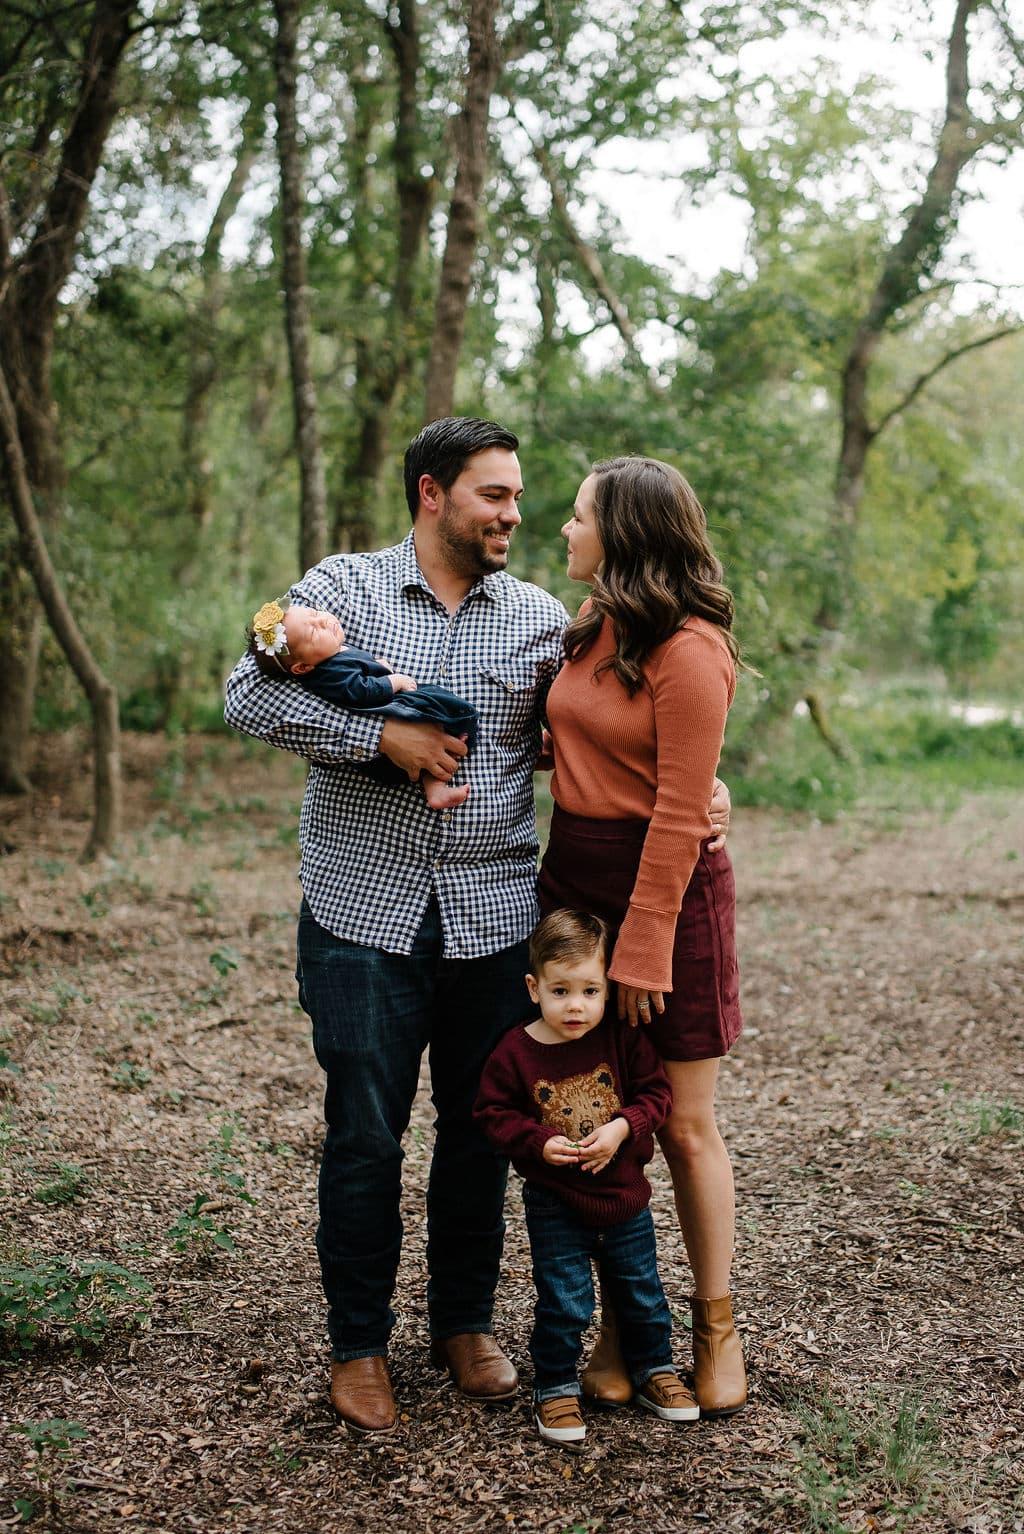 Cute Family Photos. Texas Family Photographer. Family Portraits